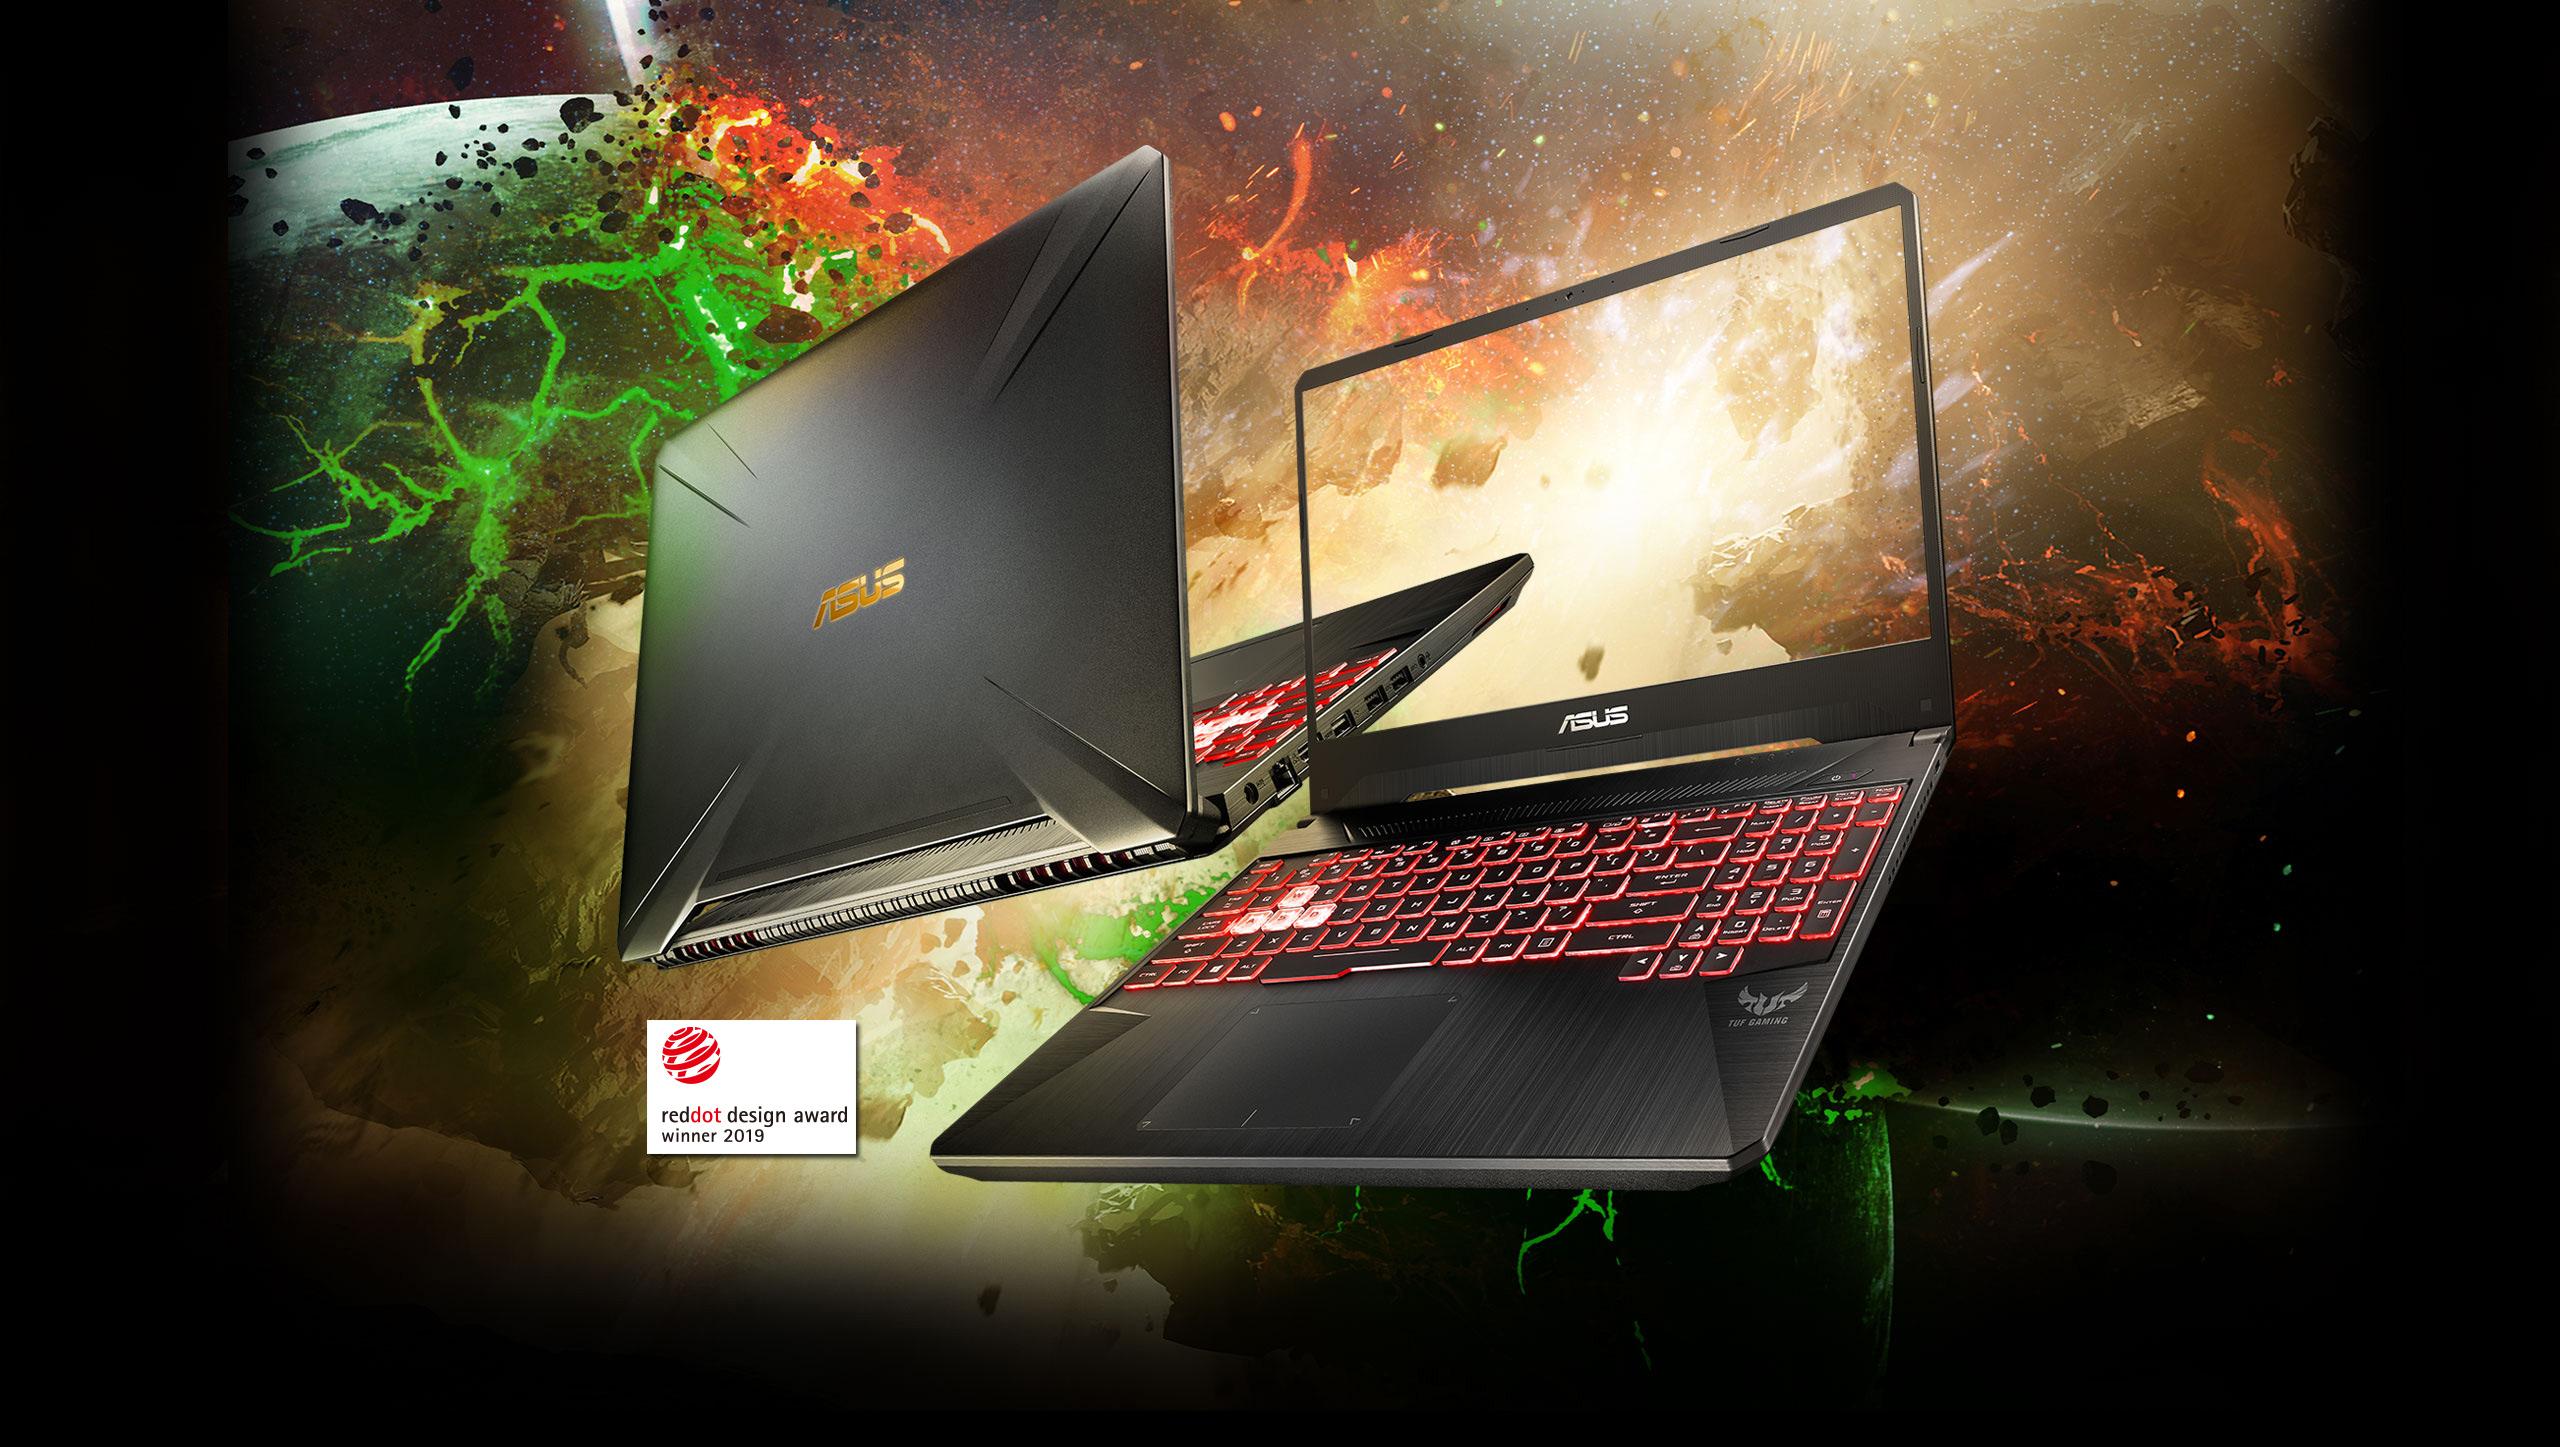 ASUS TUF FX505DT Ryzen 7 GTX 1650 Gaming Laptop